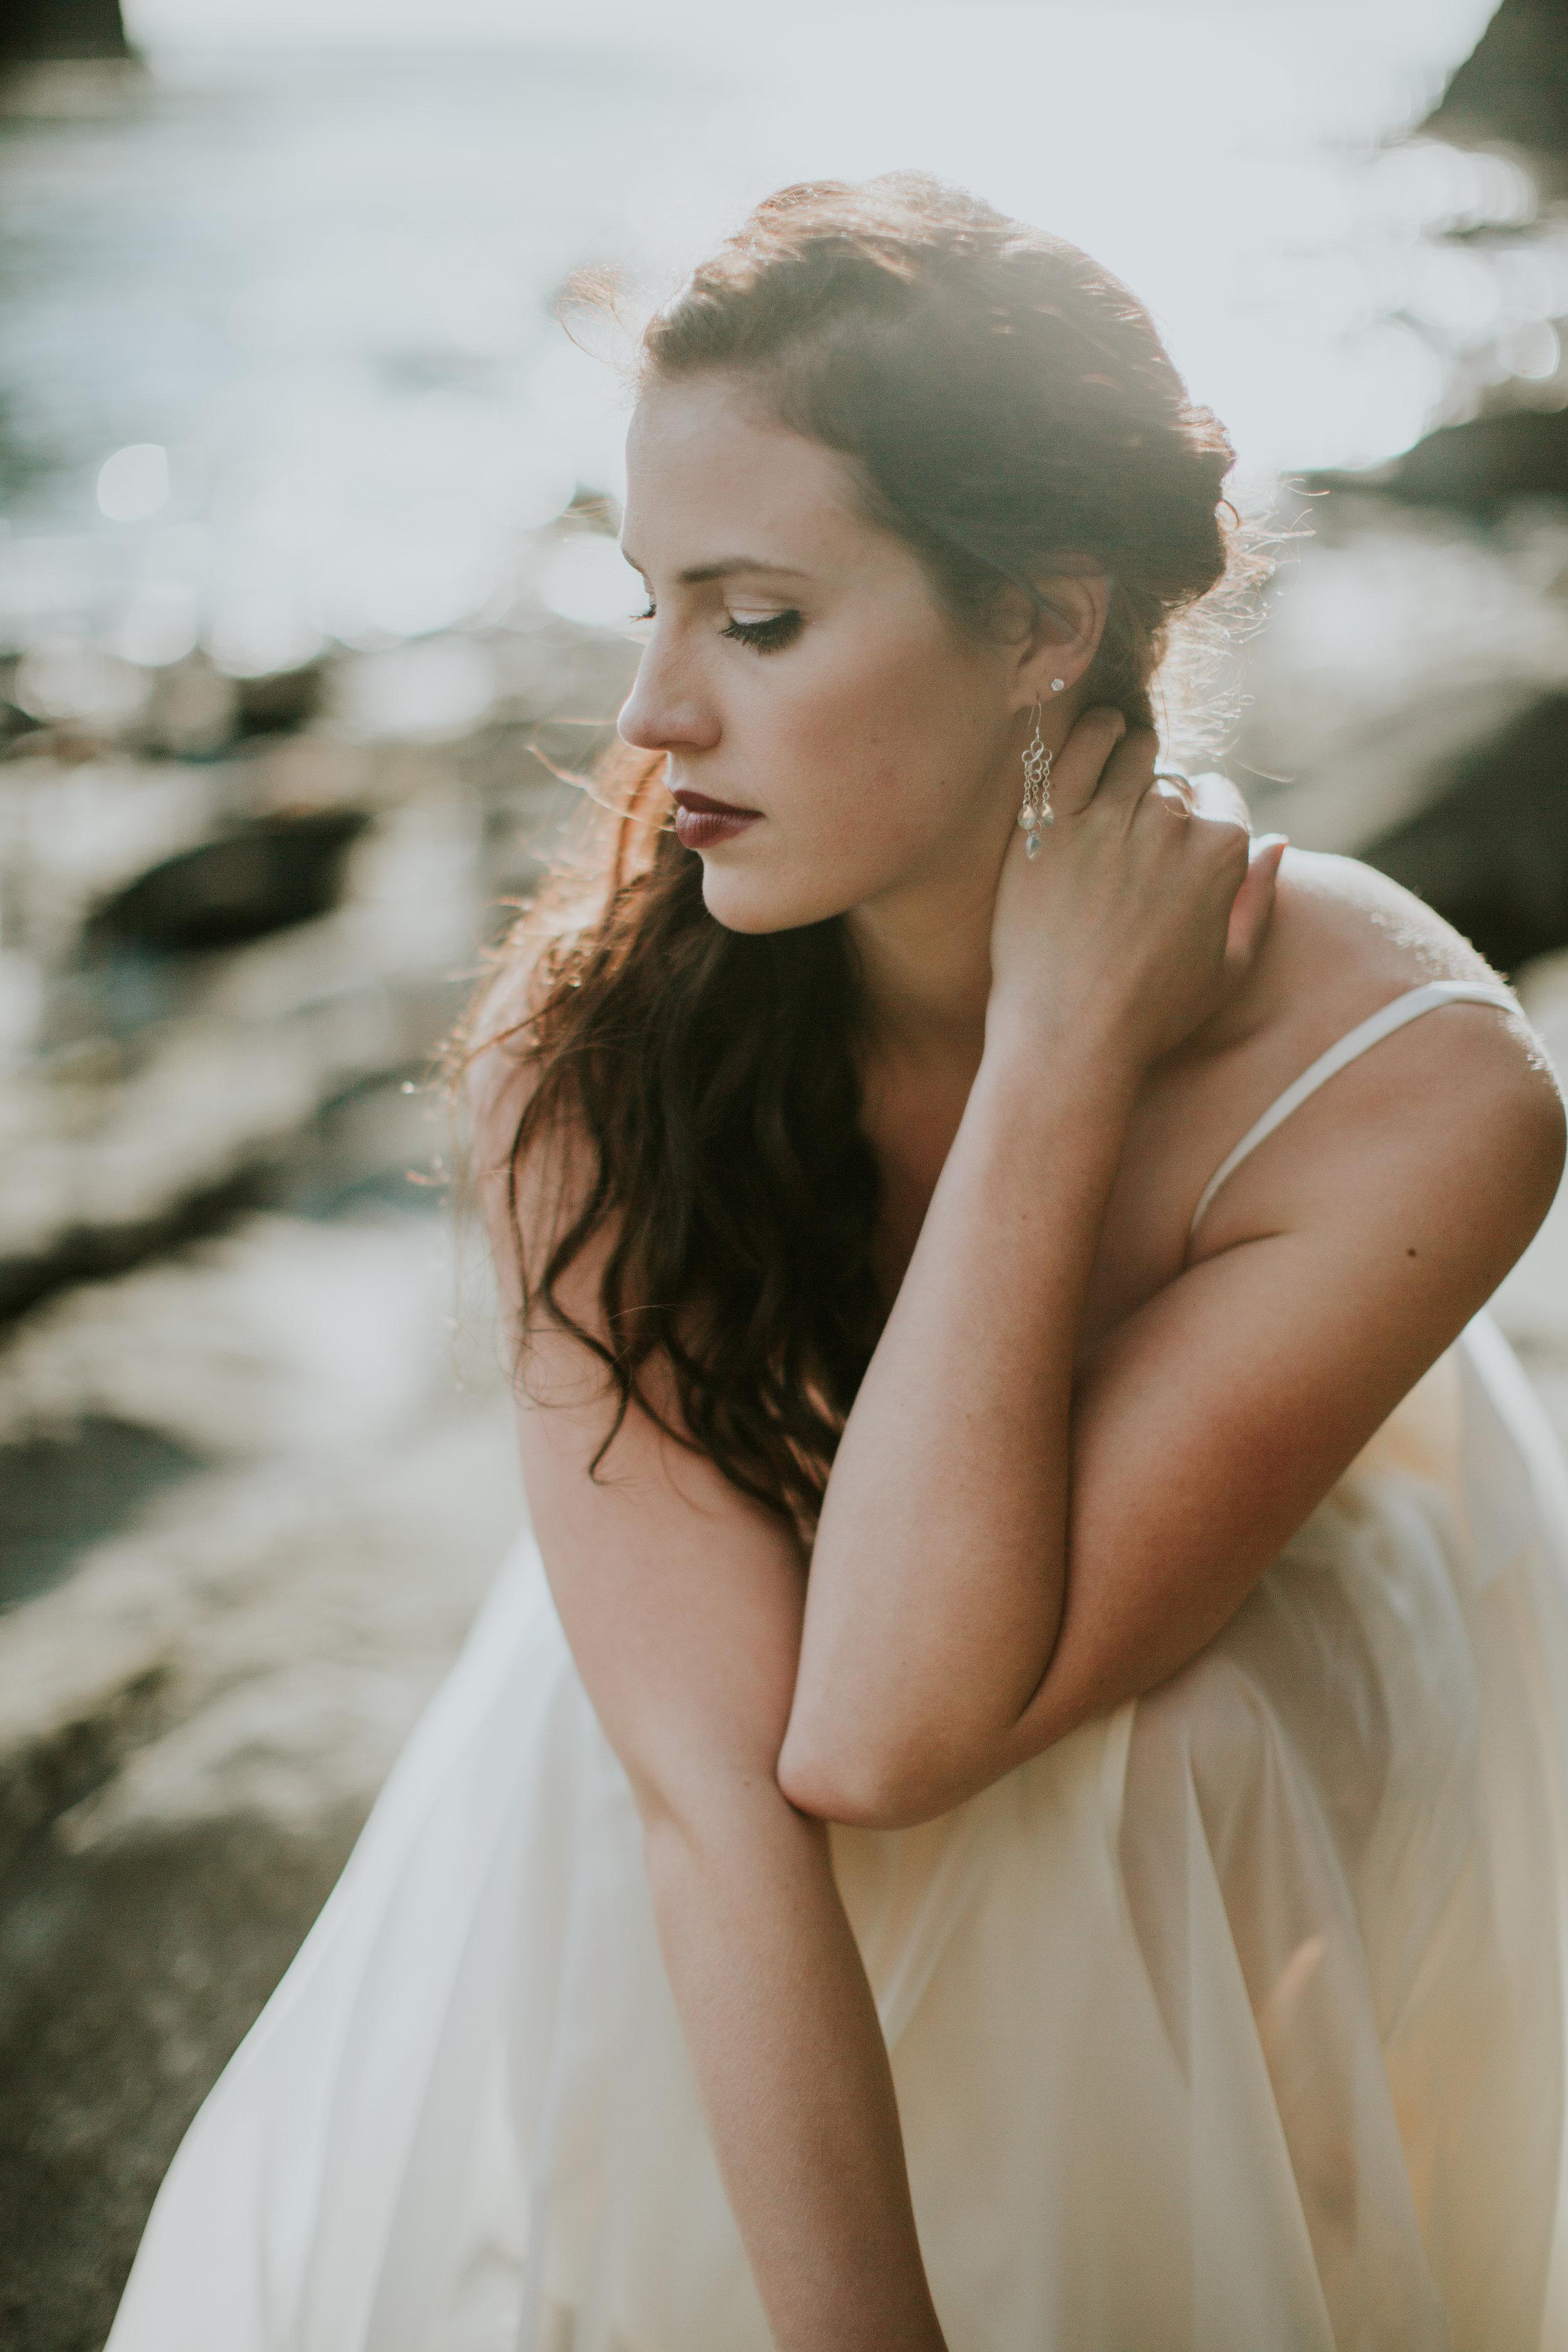 Port-Angeles-Salt-Creek-beach-wedding-bride-PNW-olympic-peninsula-photographer-Kayla-Dawn-Photography-outdoors-golden-hour-dancer-dress (1).jpg